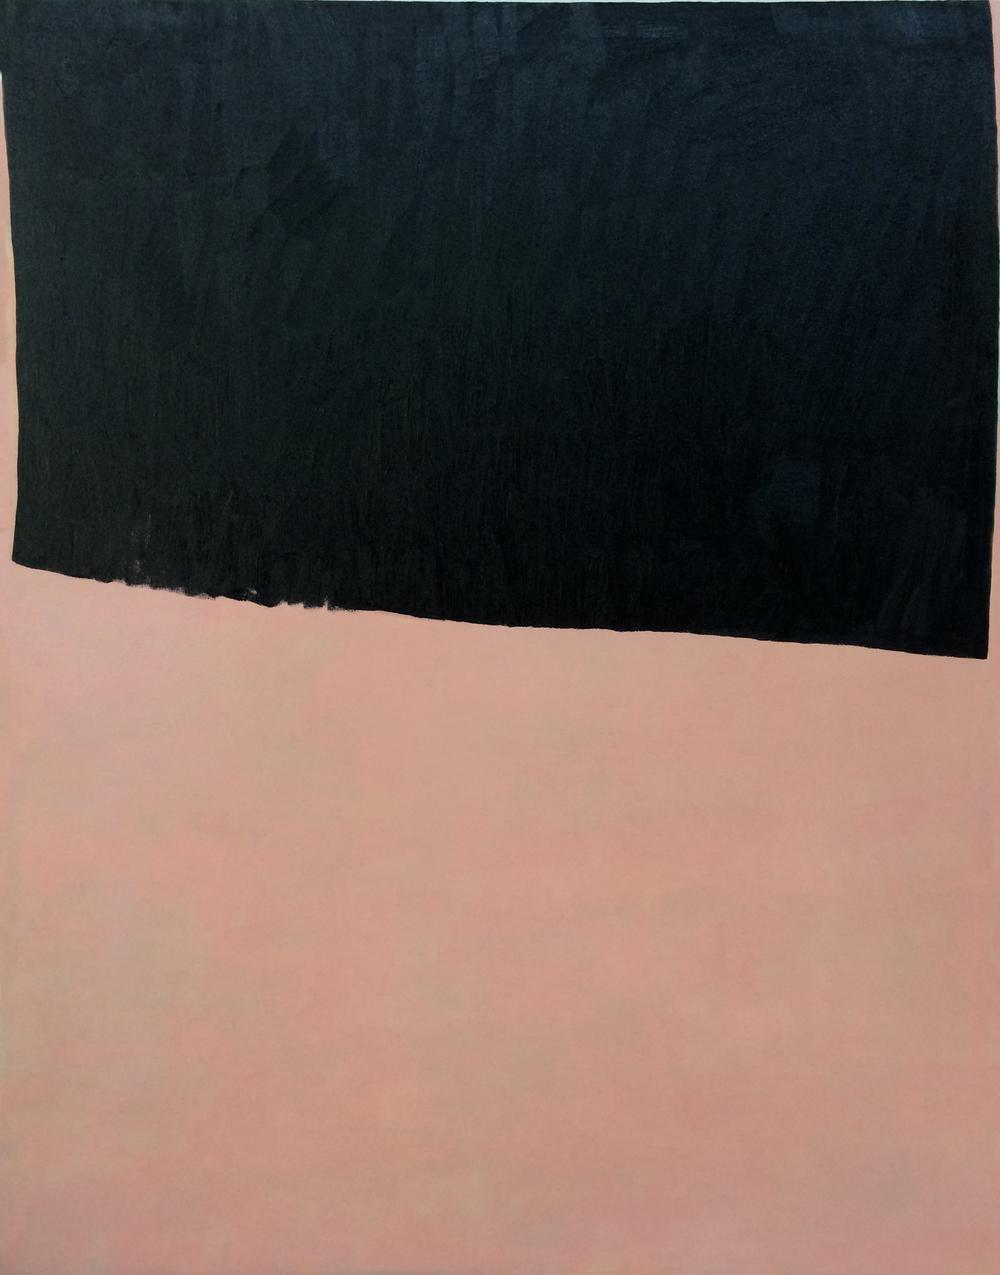 Gesture 1, 120 x 90 cms, óleo sobre lienzo